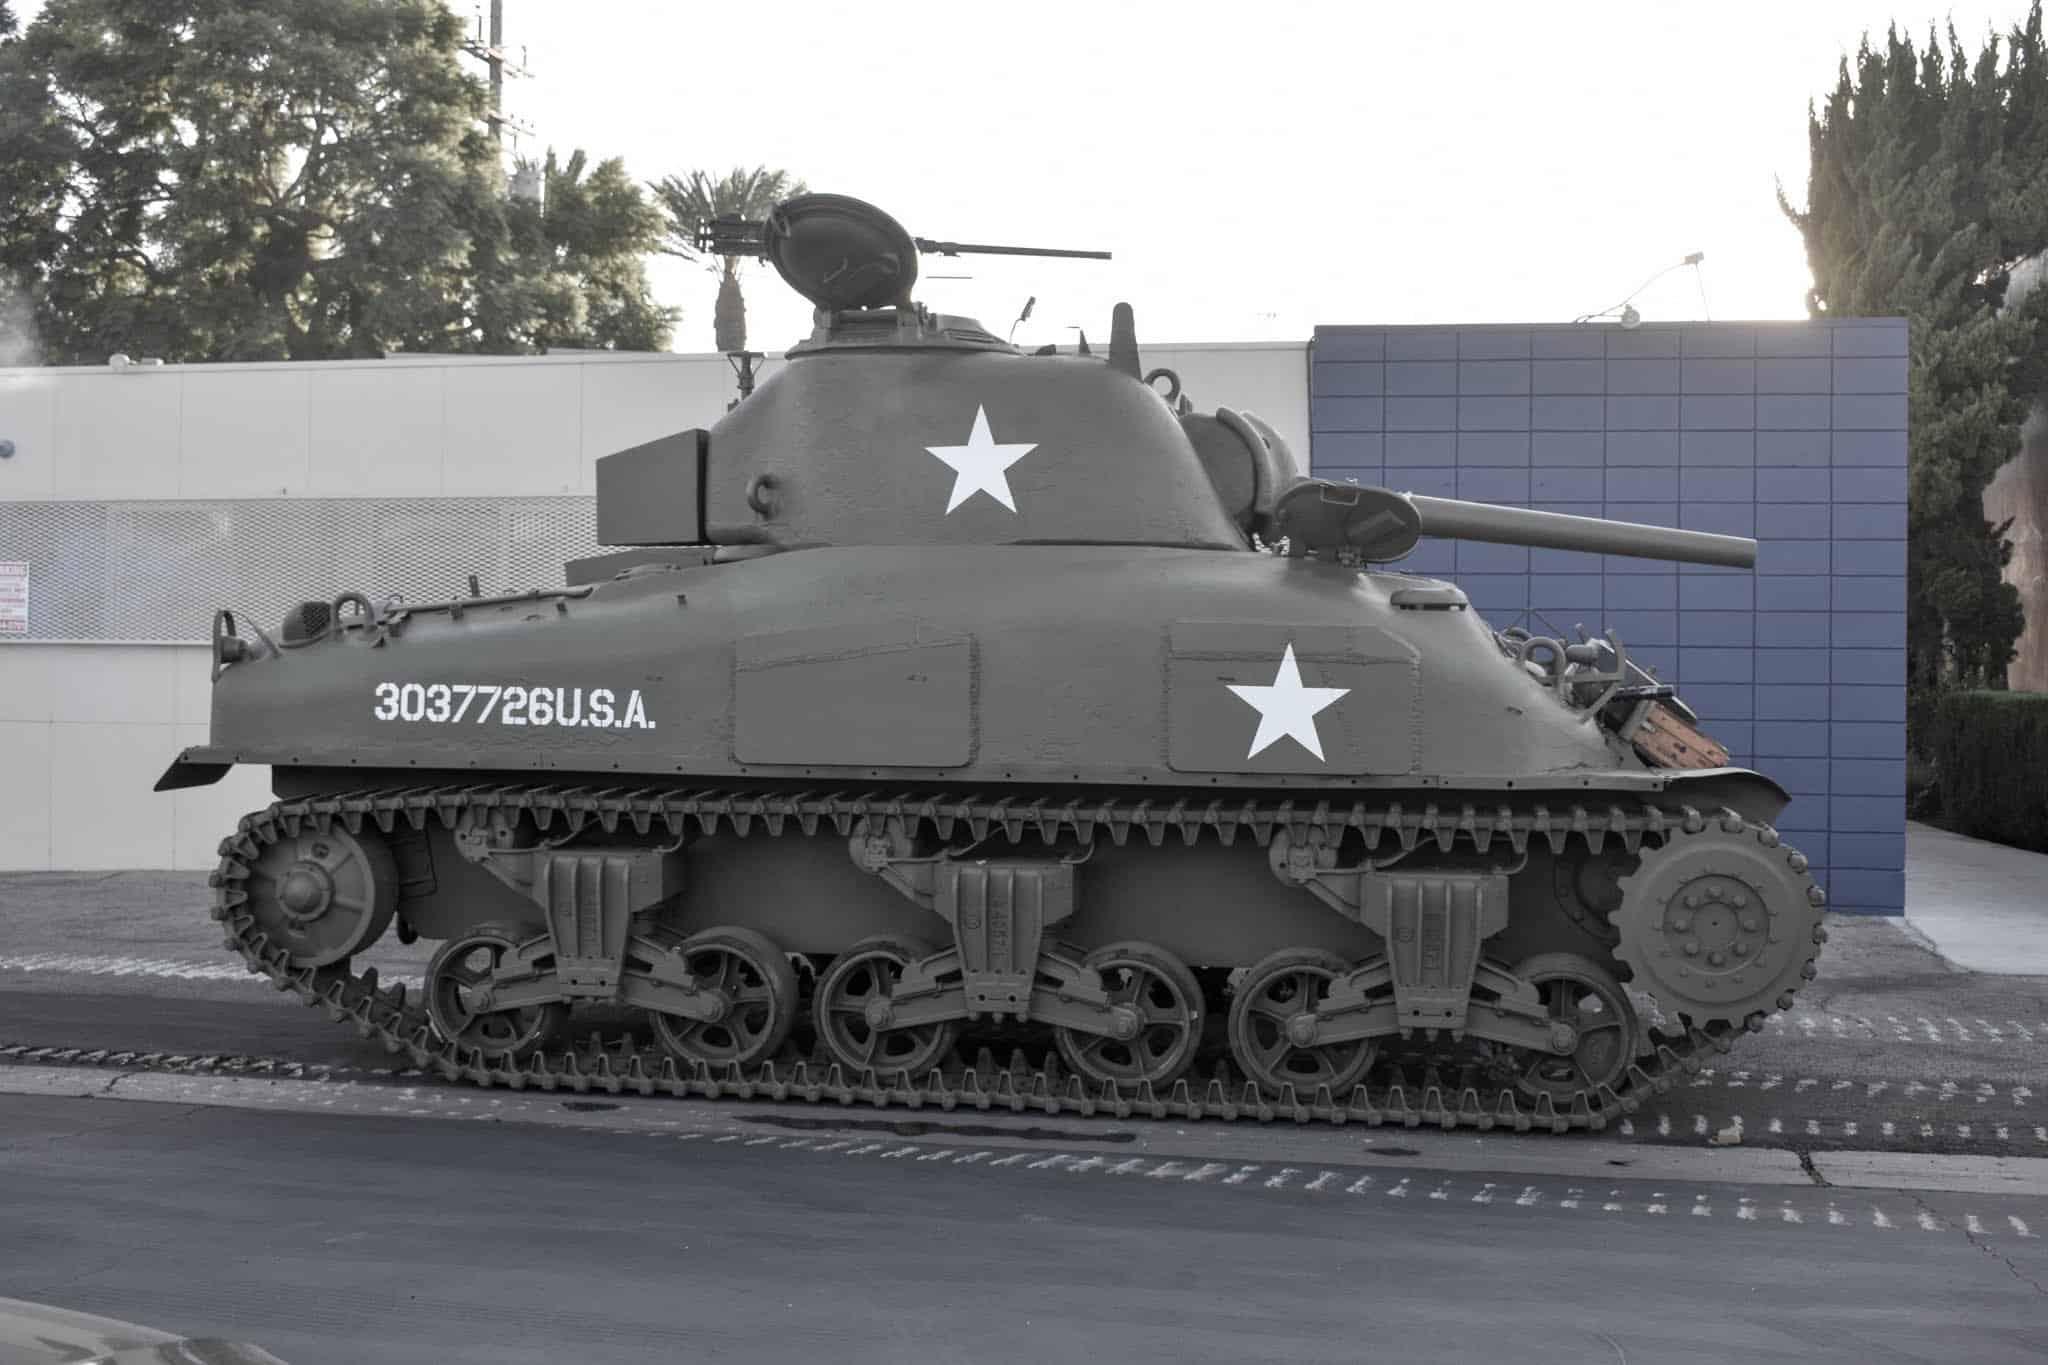 M4 Sherman - dane techniczne